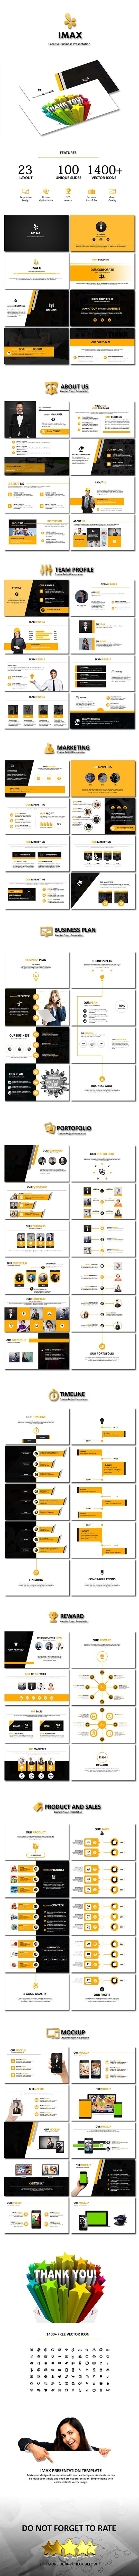 IMAX - Powerpoint Marketing Presentation - Business PowerPoint Templates